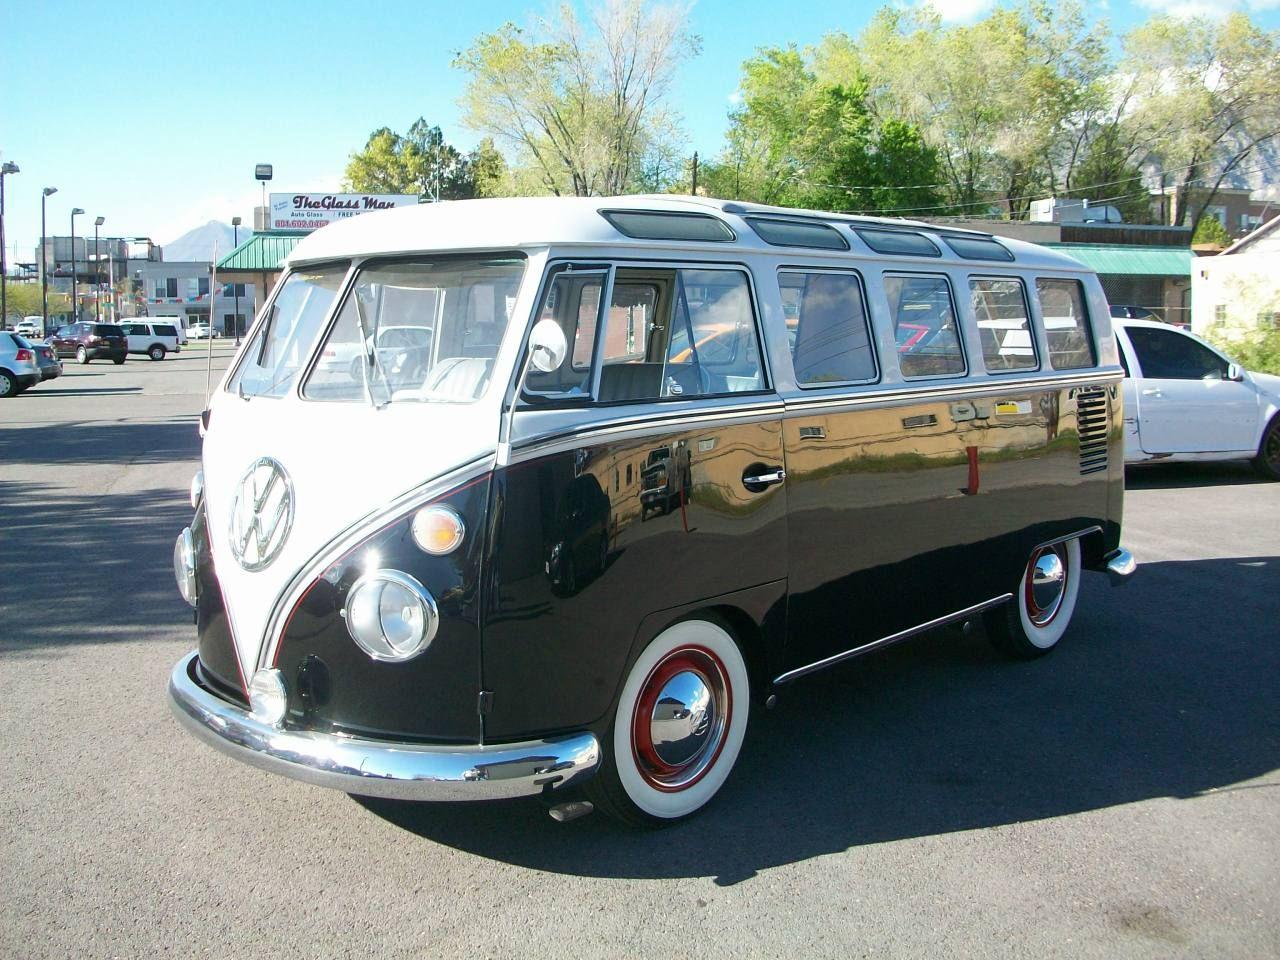 1963 volkswagen bus if wishes were fishes wish list pinterest. Black Bedroom Furniture Sets. Home Design Ideas